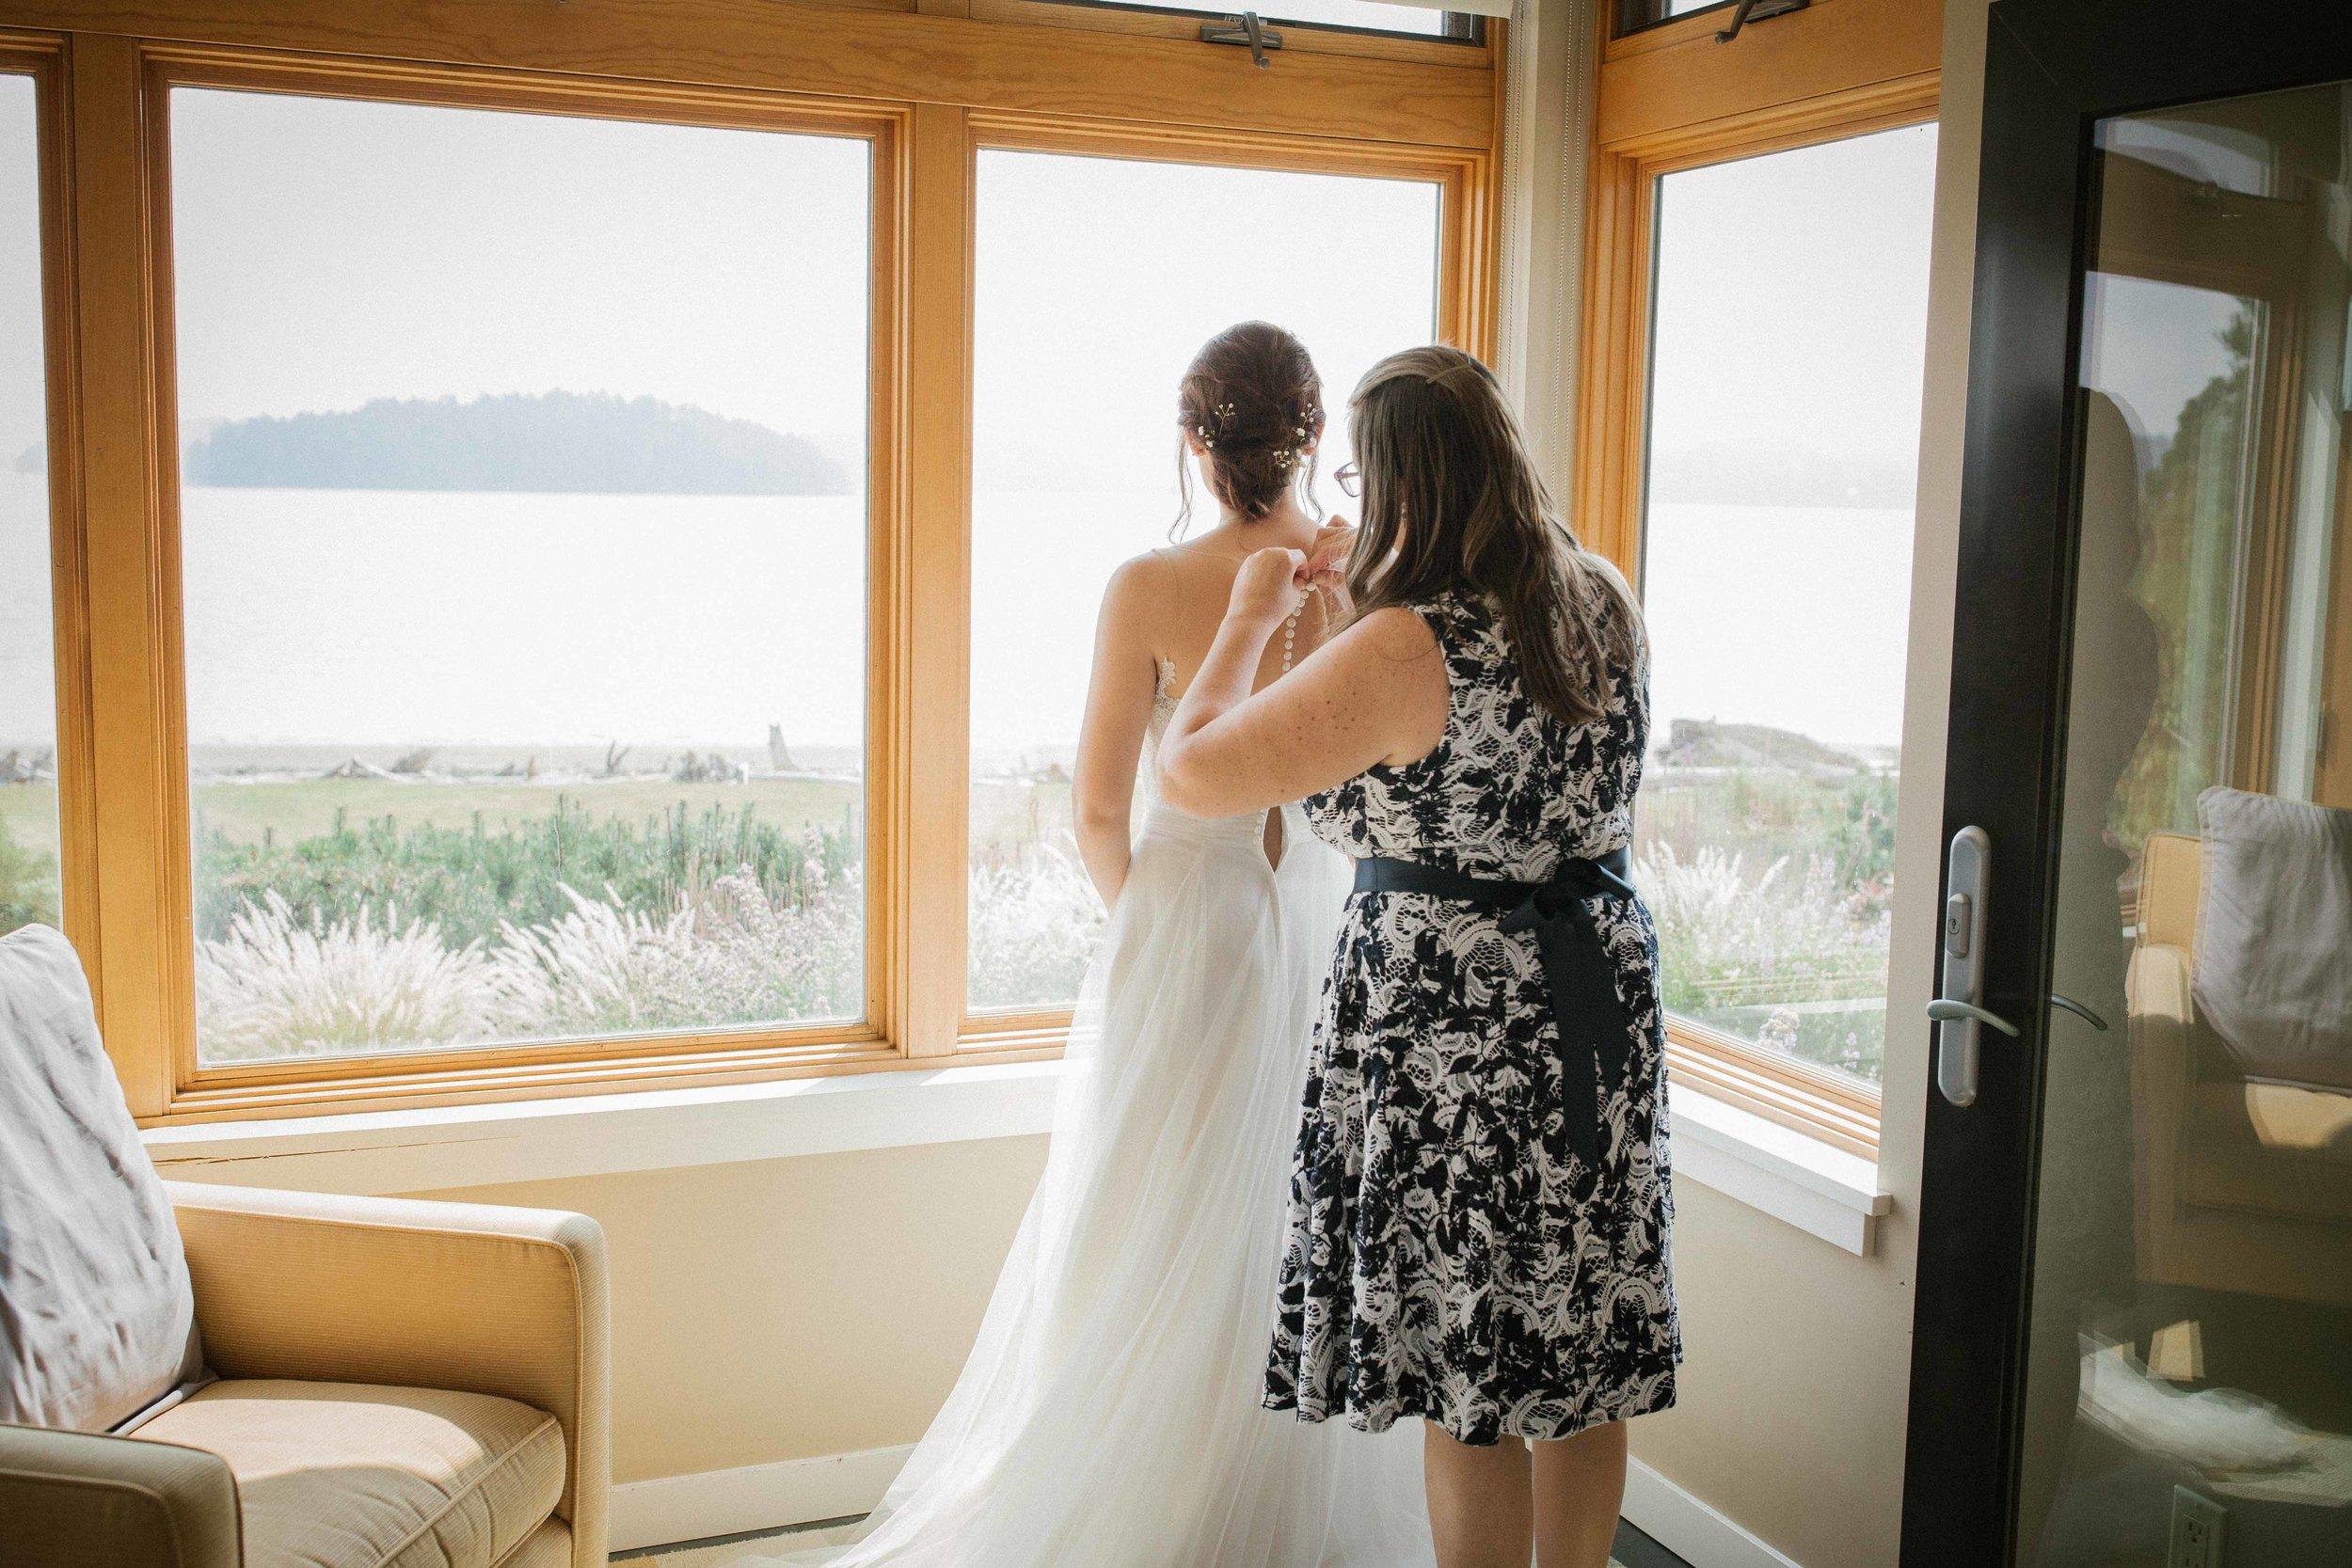 deception-pass-wedding-9.jpg